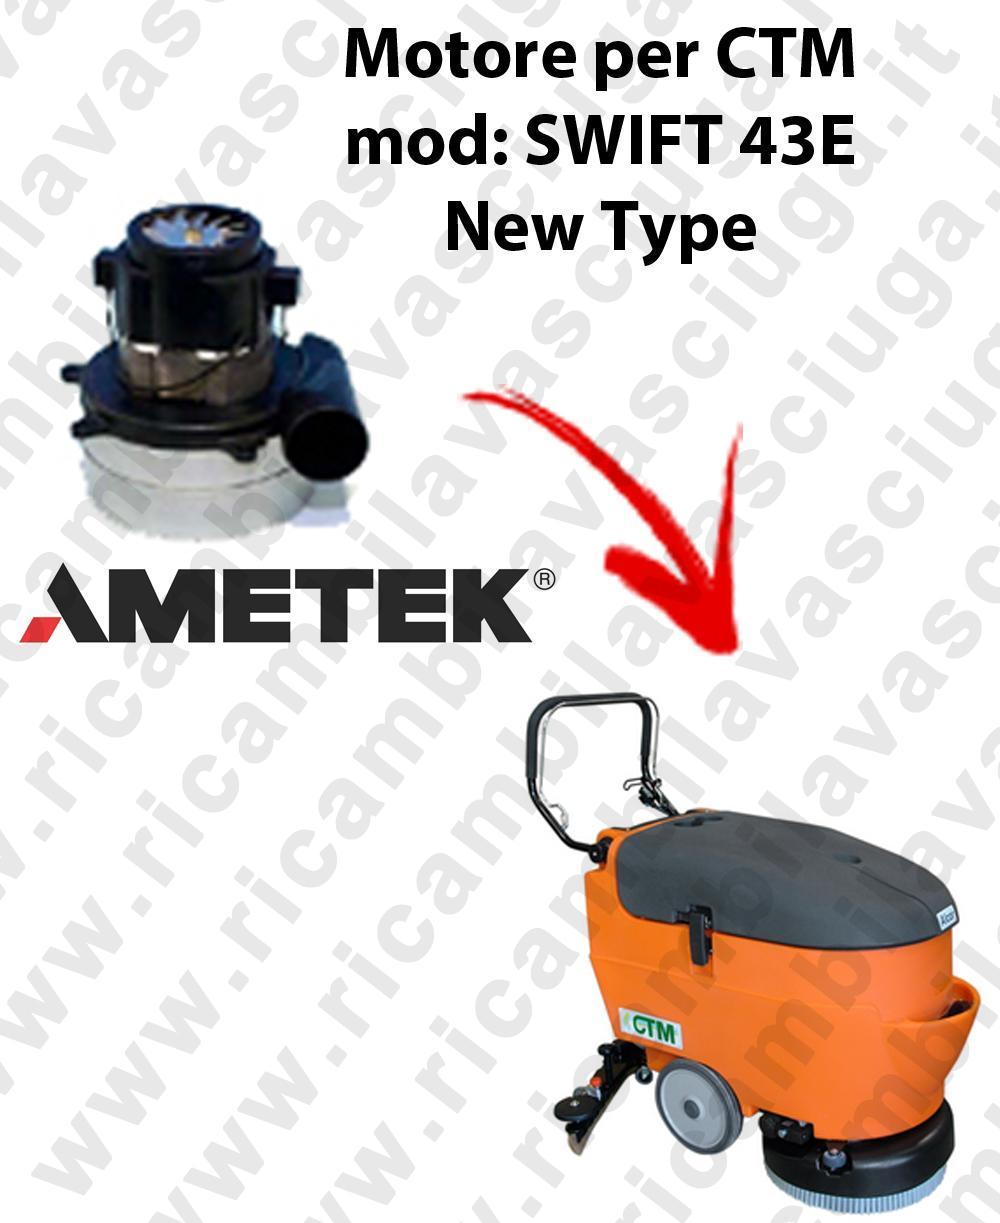 SWIFT 43 y New Type MOTORE SYNCLEAN di aspirazione para fregadora CTM